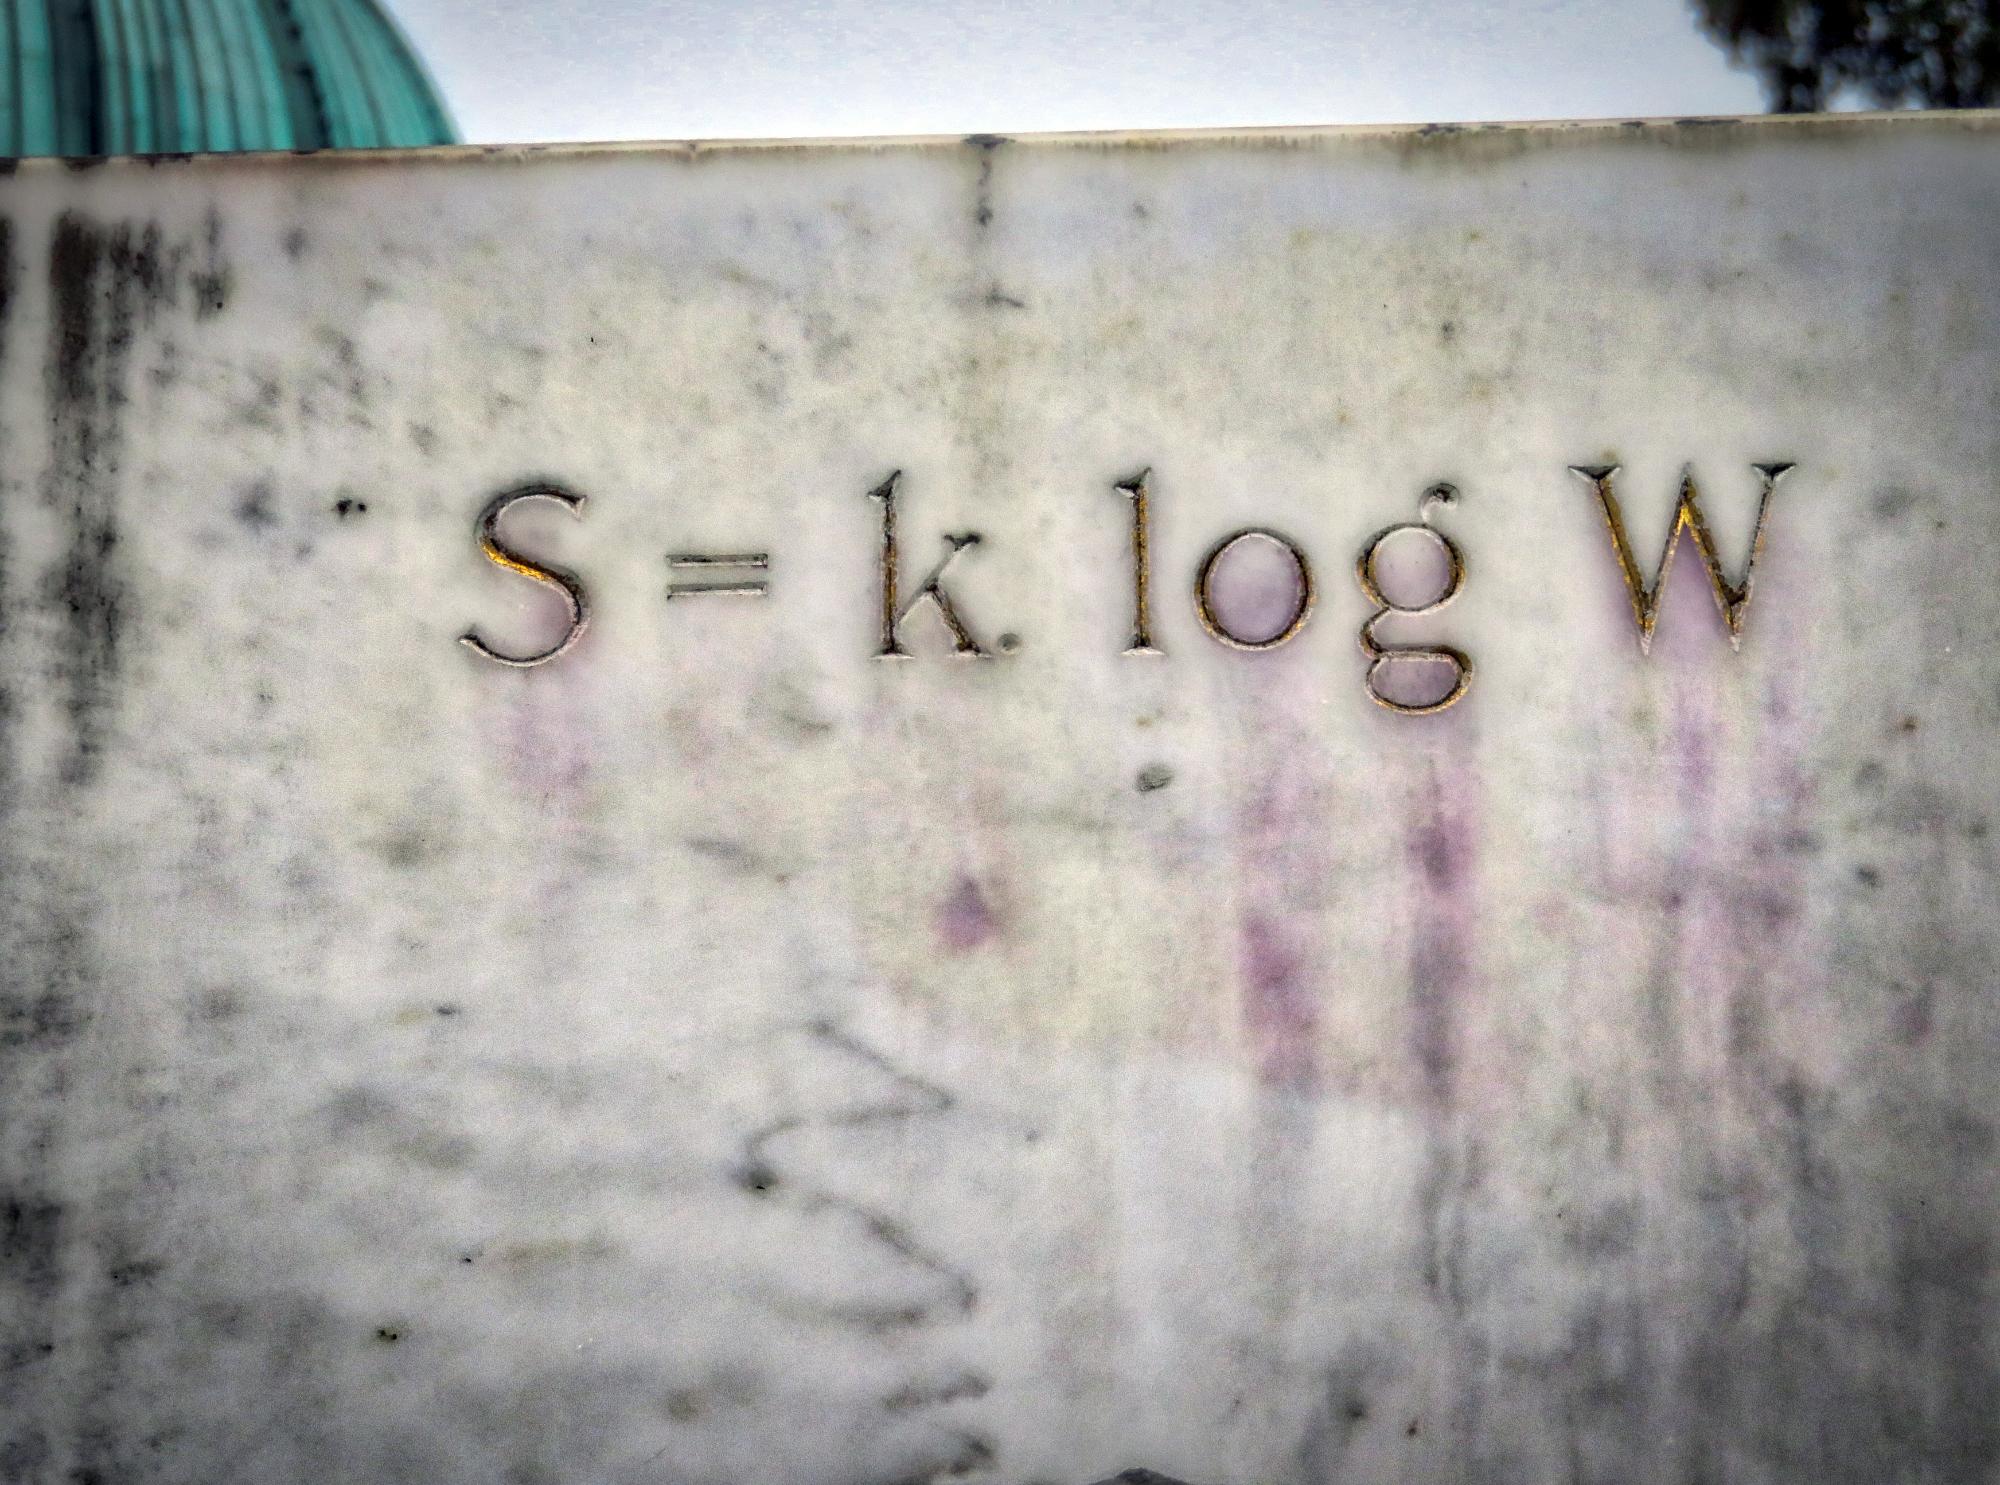 S=k log W ルドウィグ ボルツマン